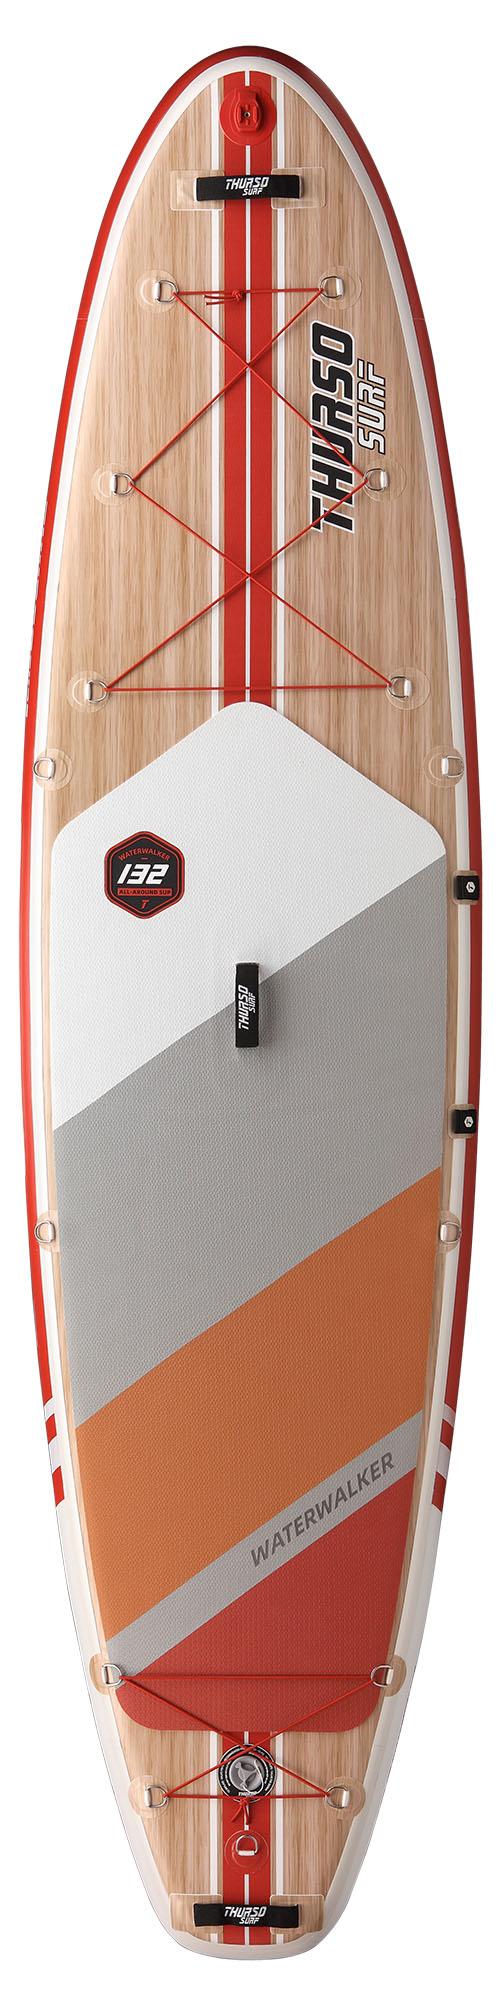 stand-up-paddle-board-waterwalker-132-crimson-thurso-surf-board-only-vertical.jpg